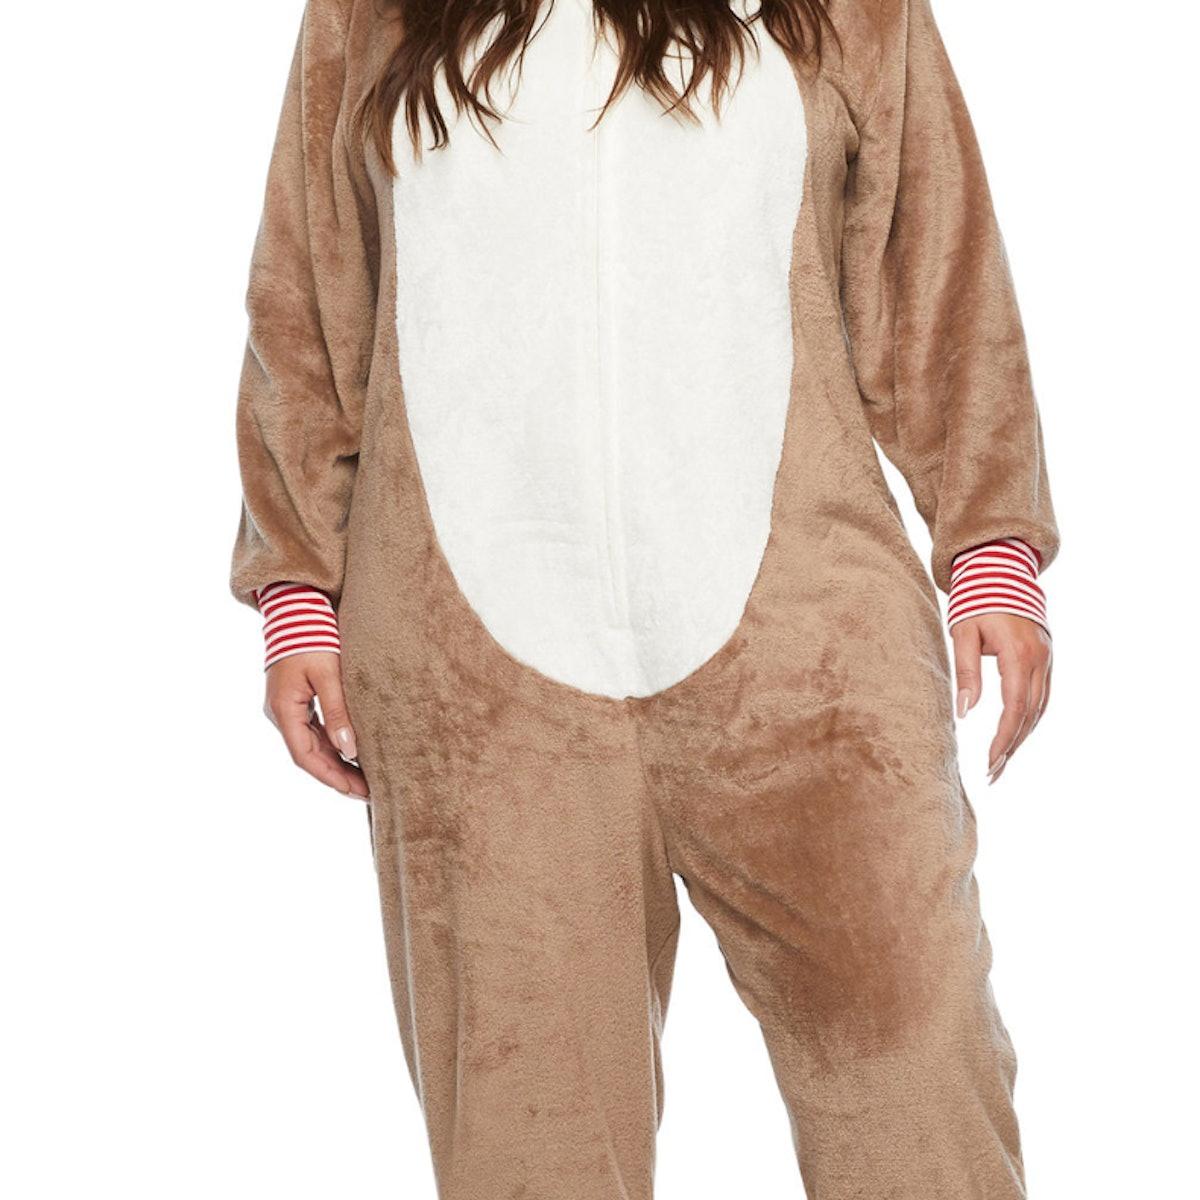 North Pole Trading Co. Reindeer Unisex Adult Plus Plush Long Sleeve One Piece Pajama